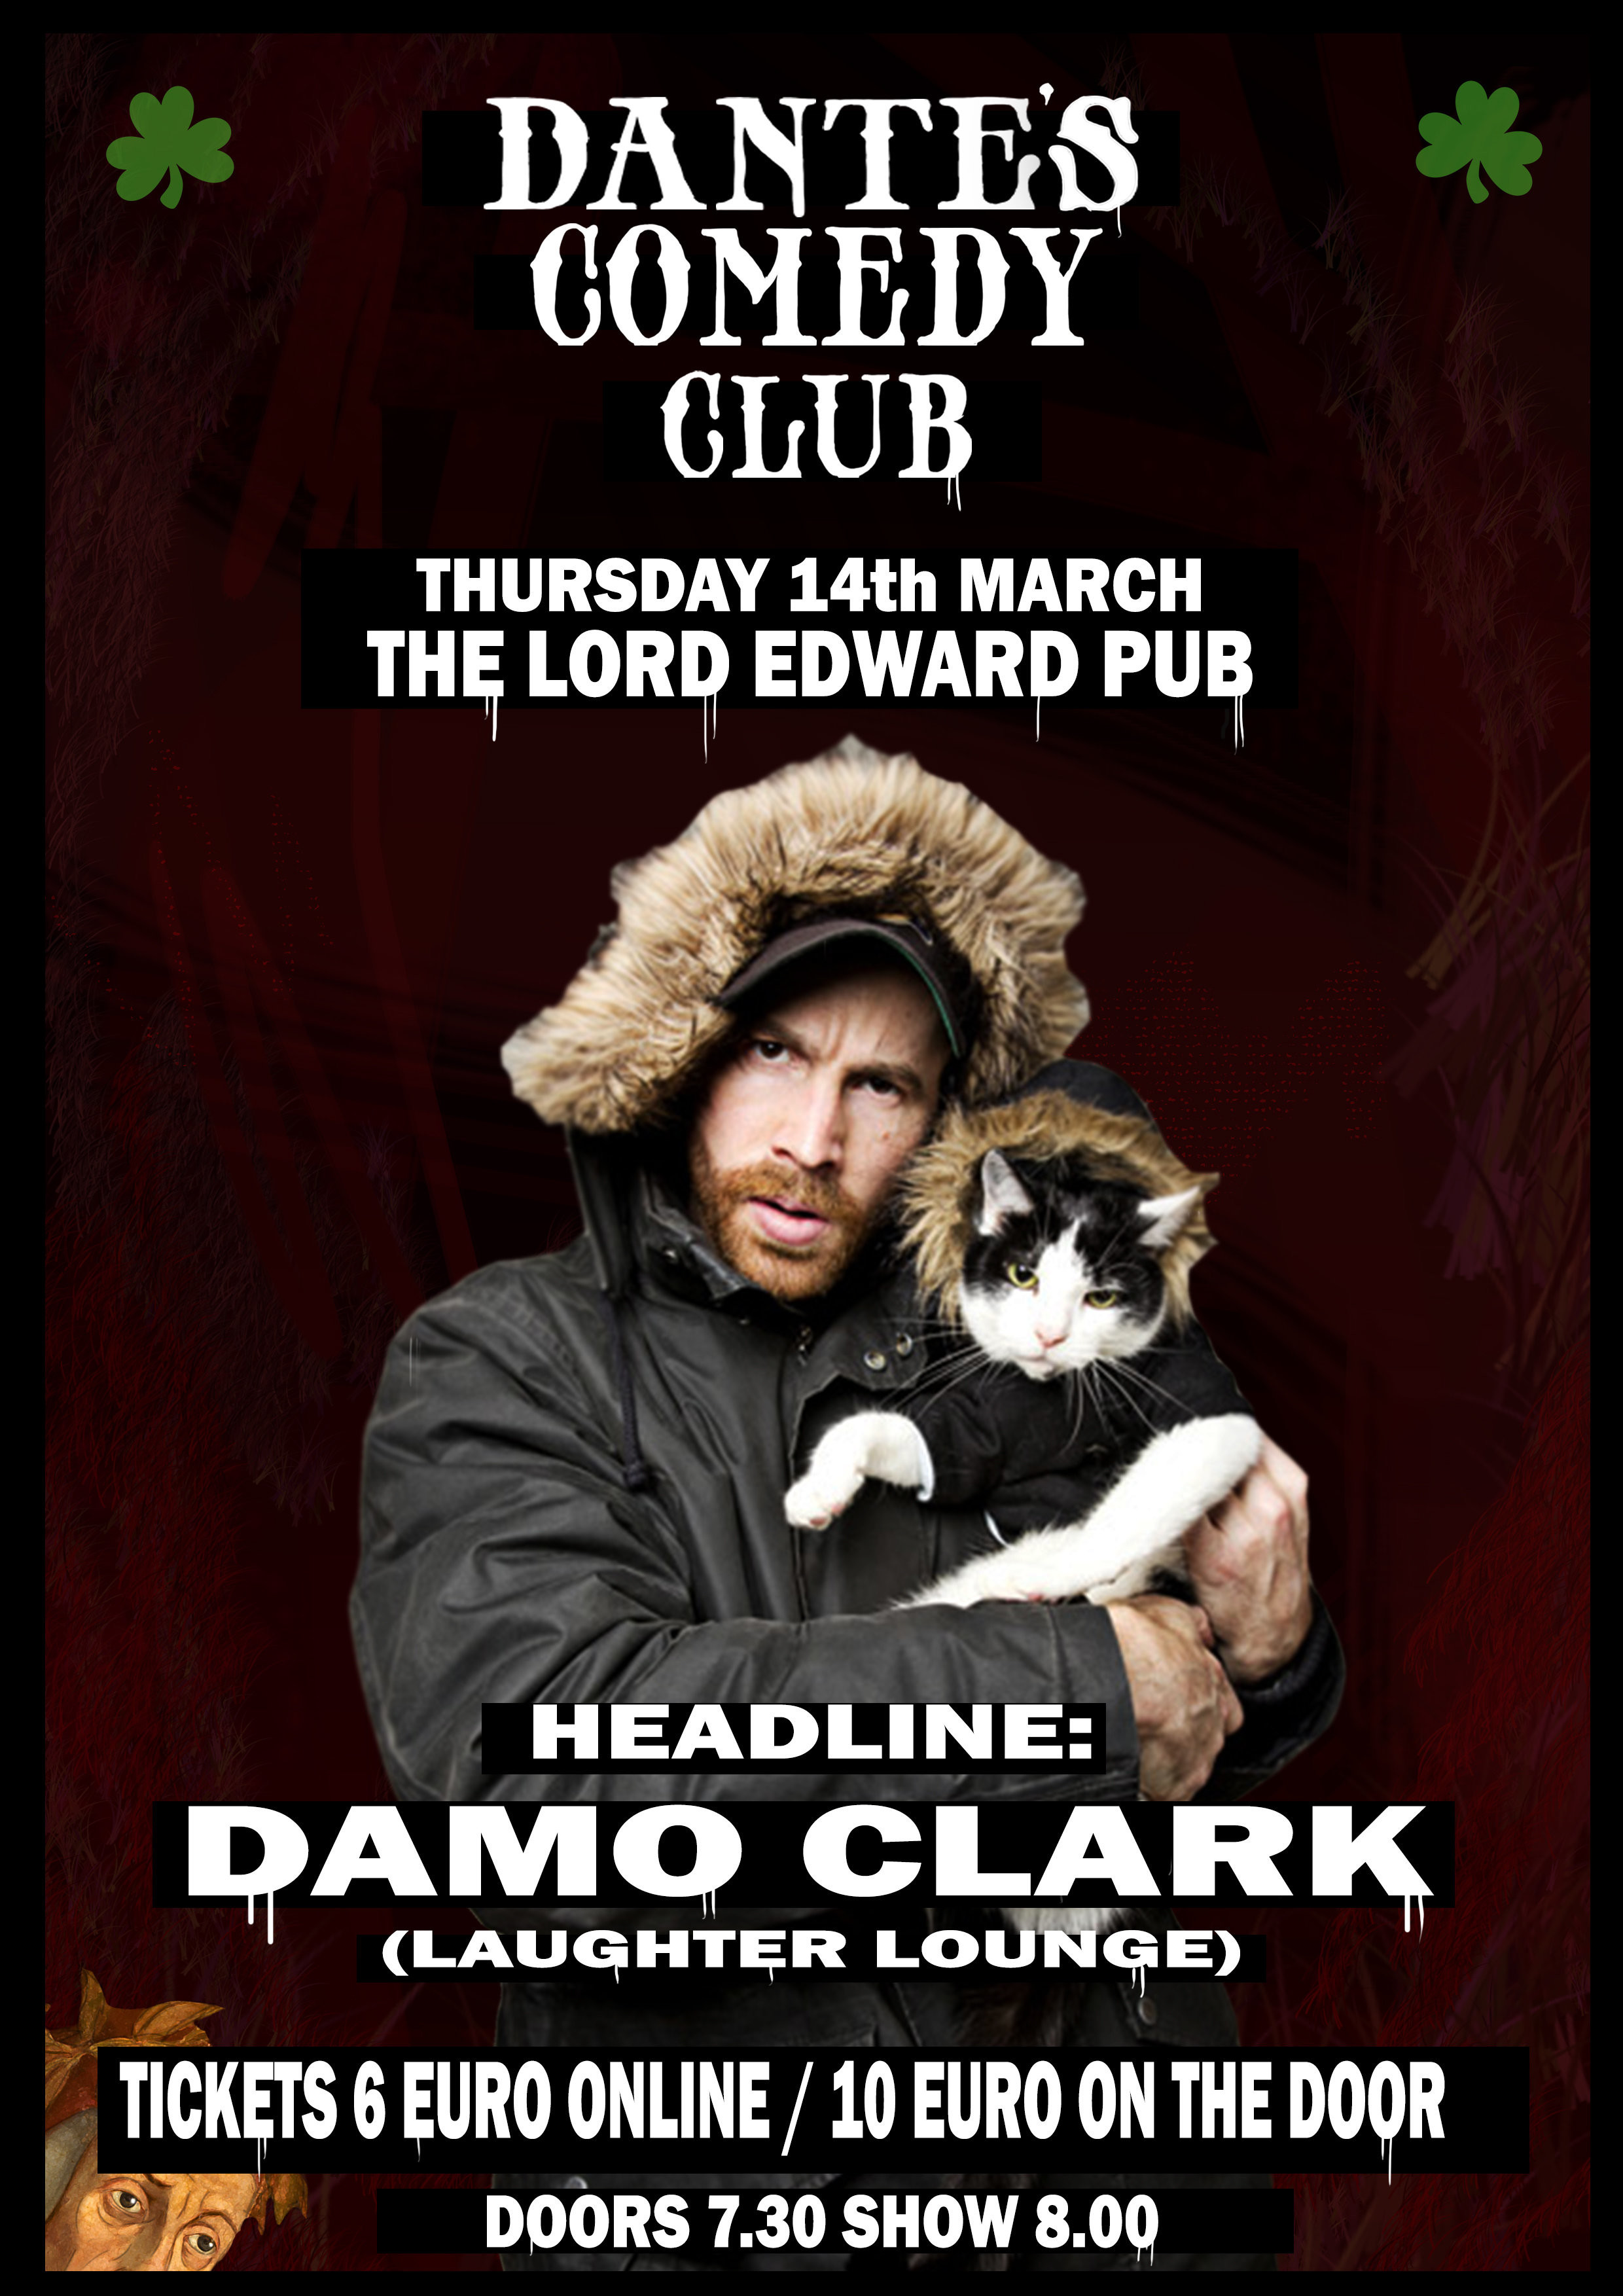 Damo clark poster